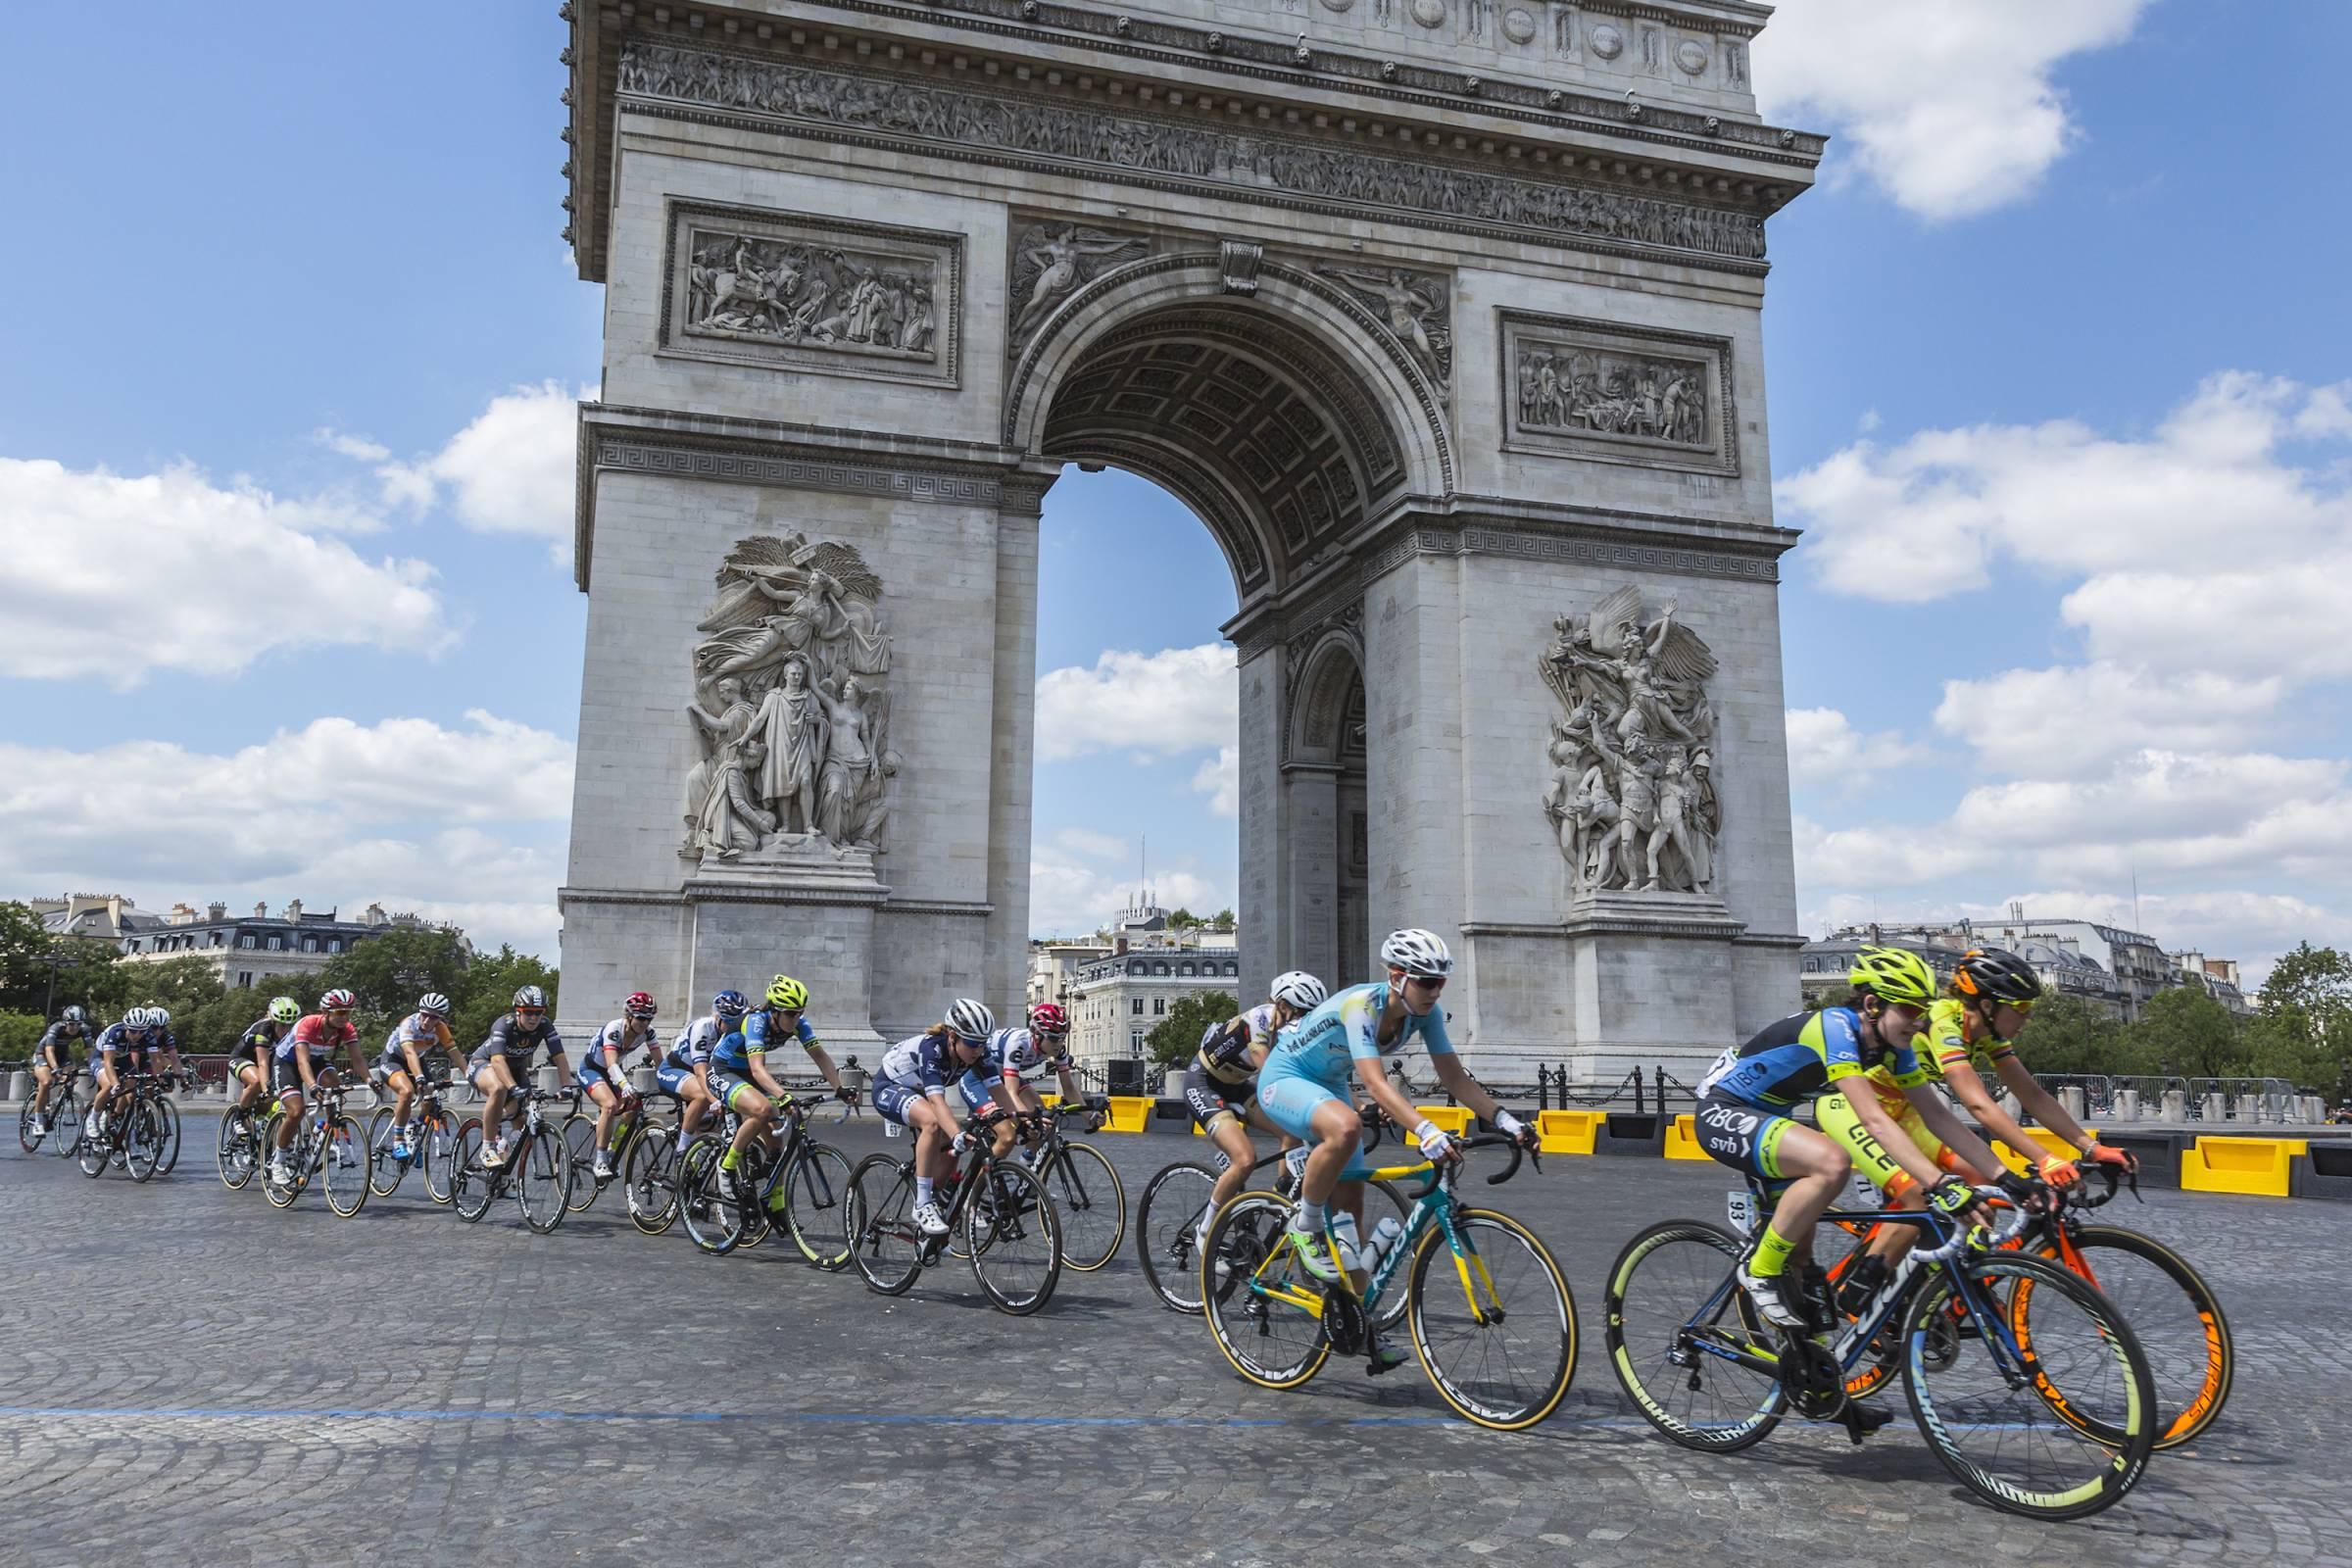 feminine peloton riding La Course in Paris, France